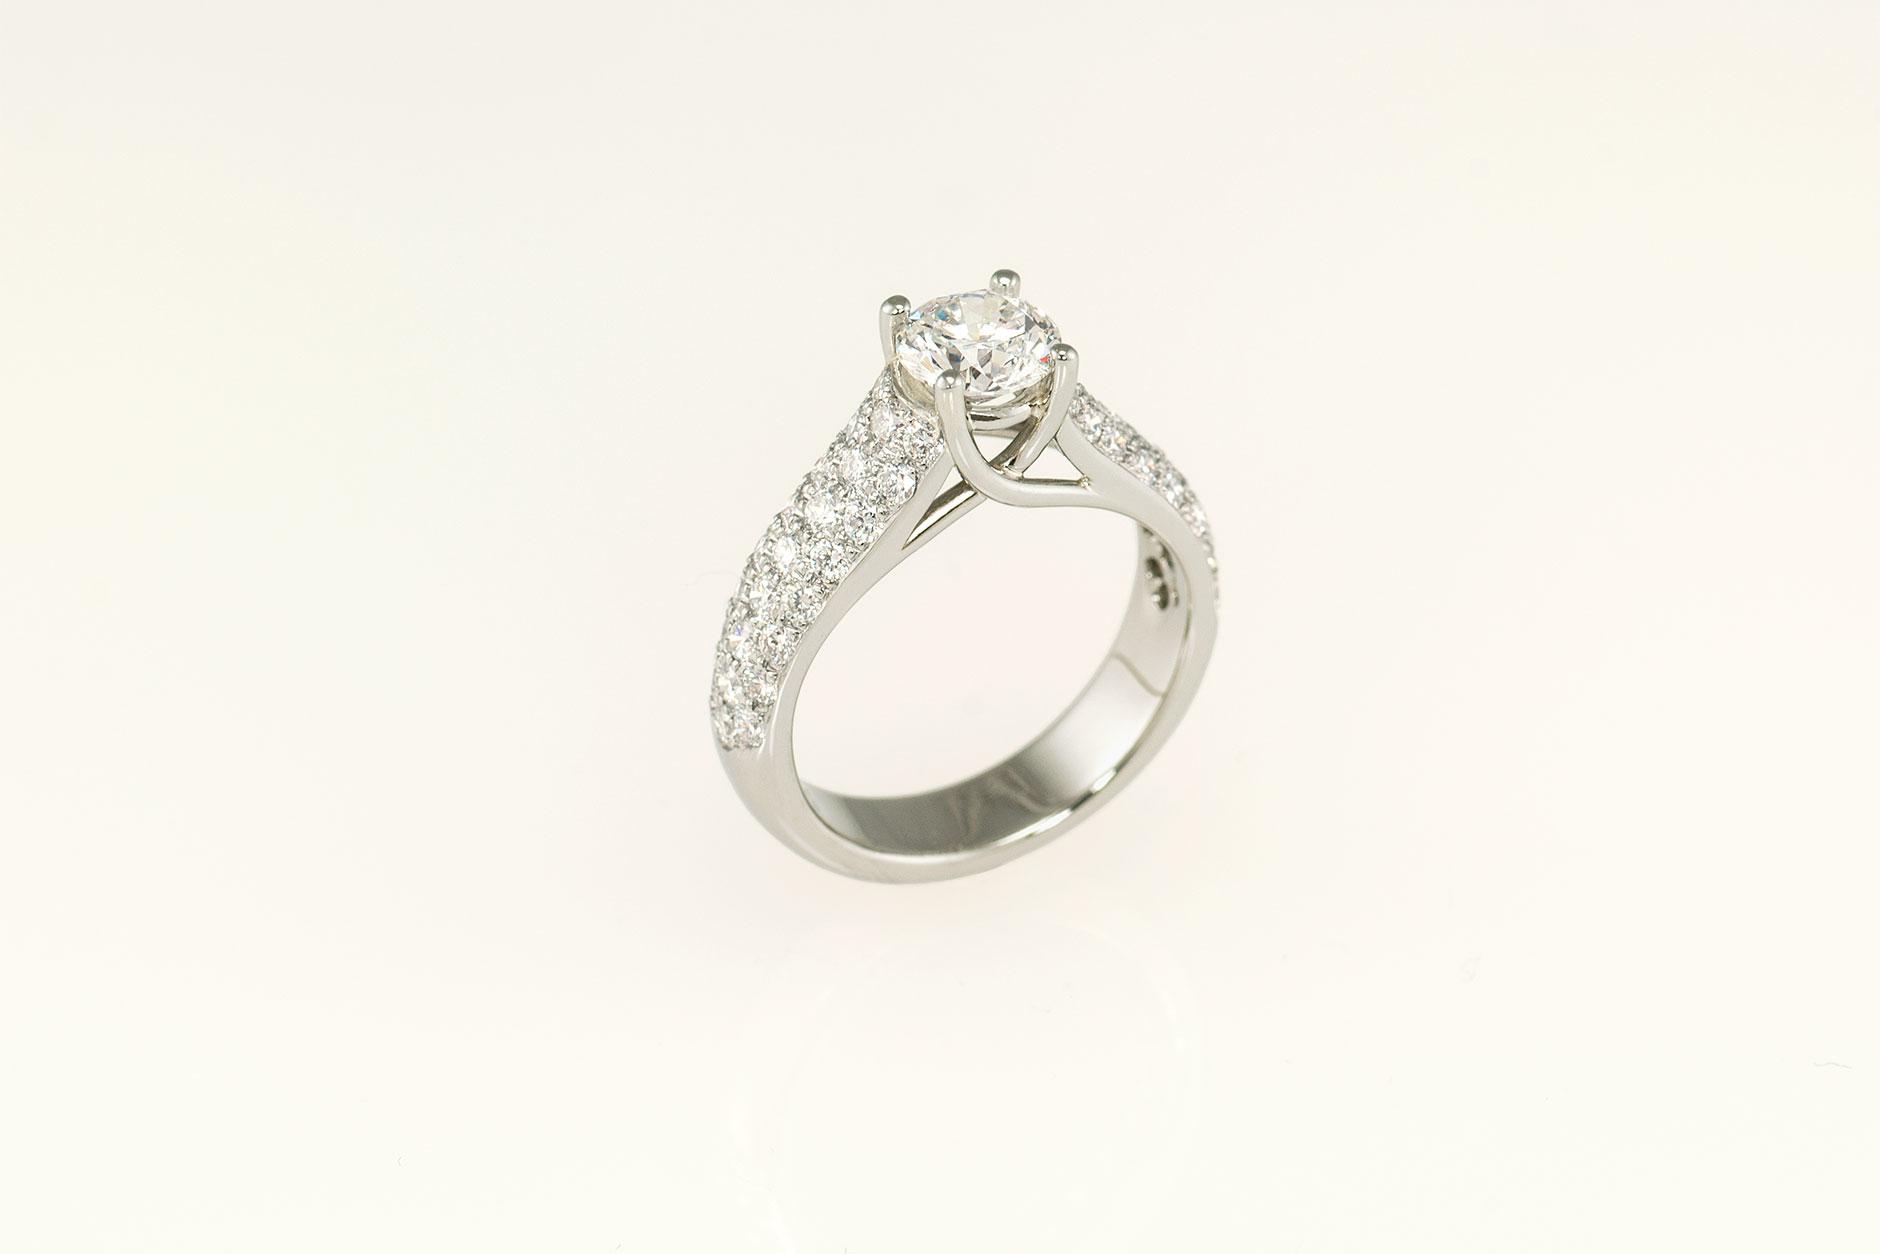 Crossover Custom 19k White Gold Diamond Engagement Ring - NEWA Goldsmith